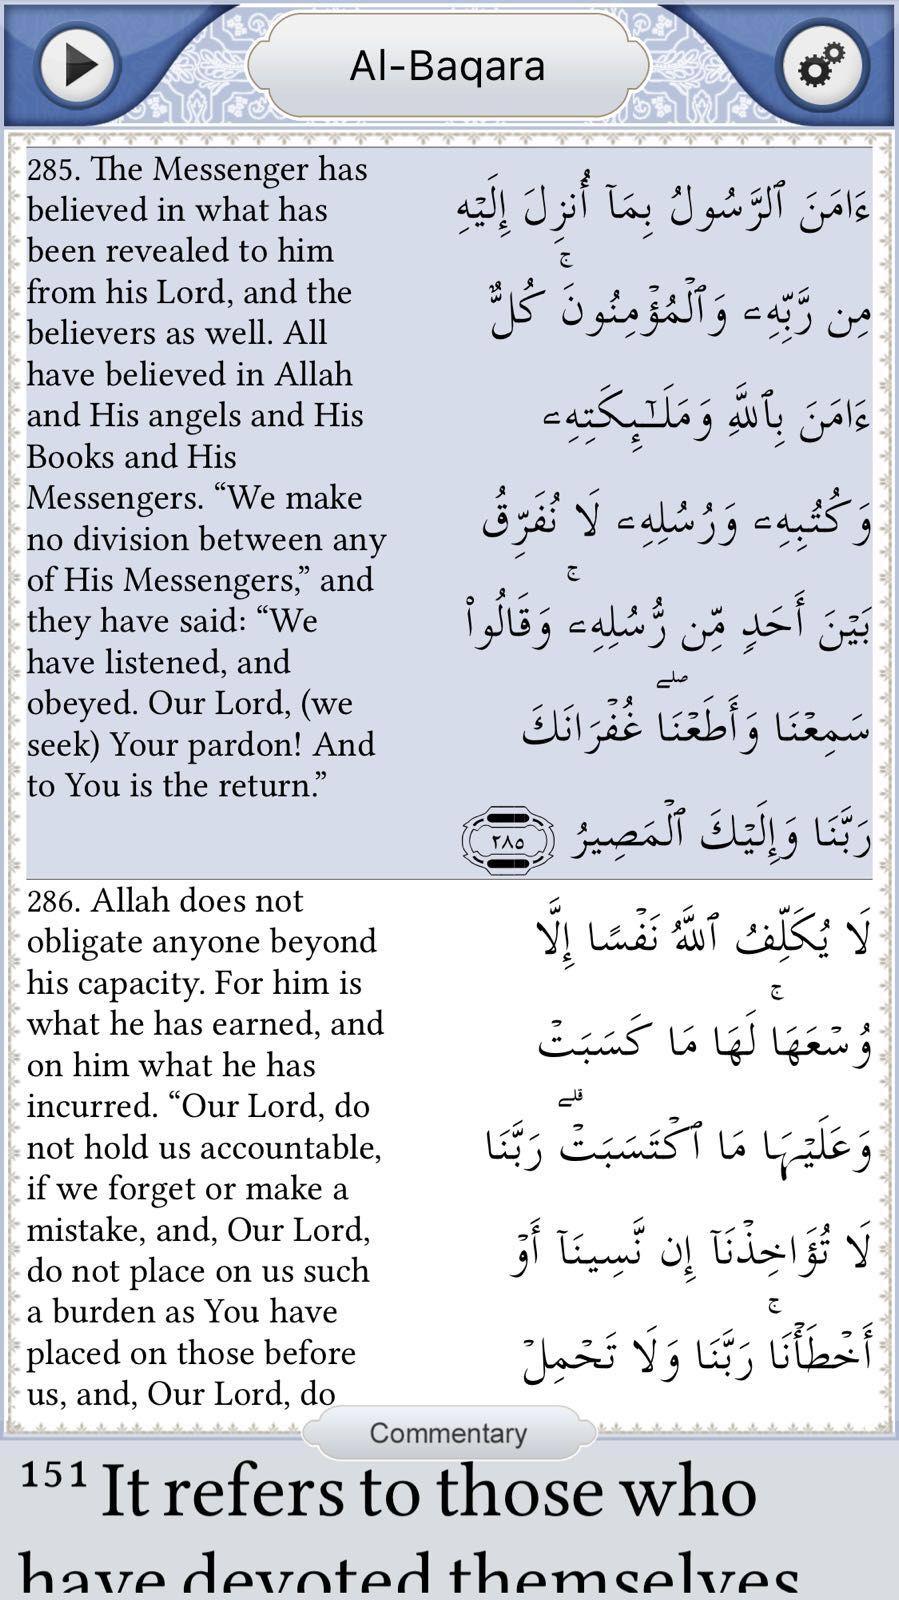 surat ke 2 dalam al quran